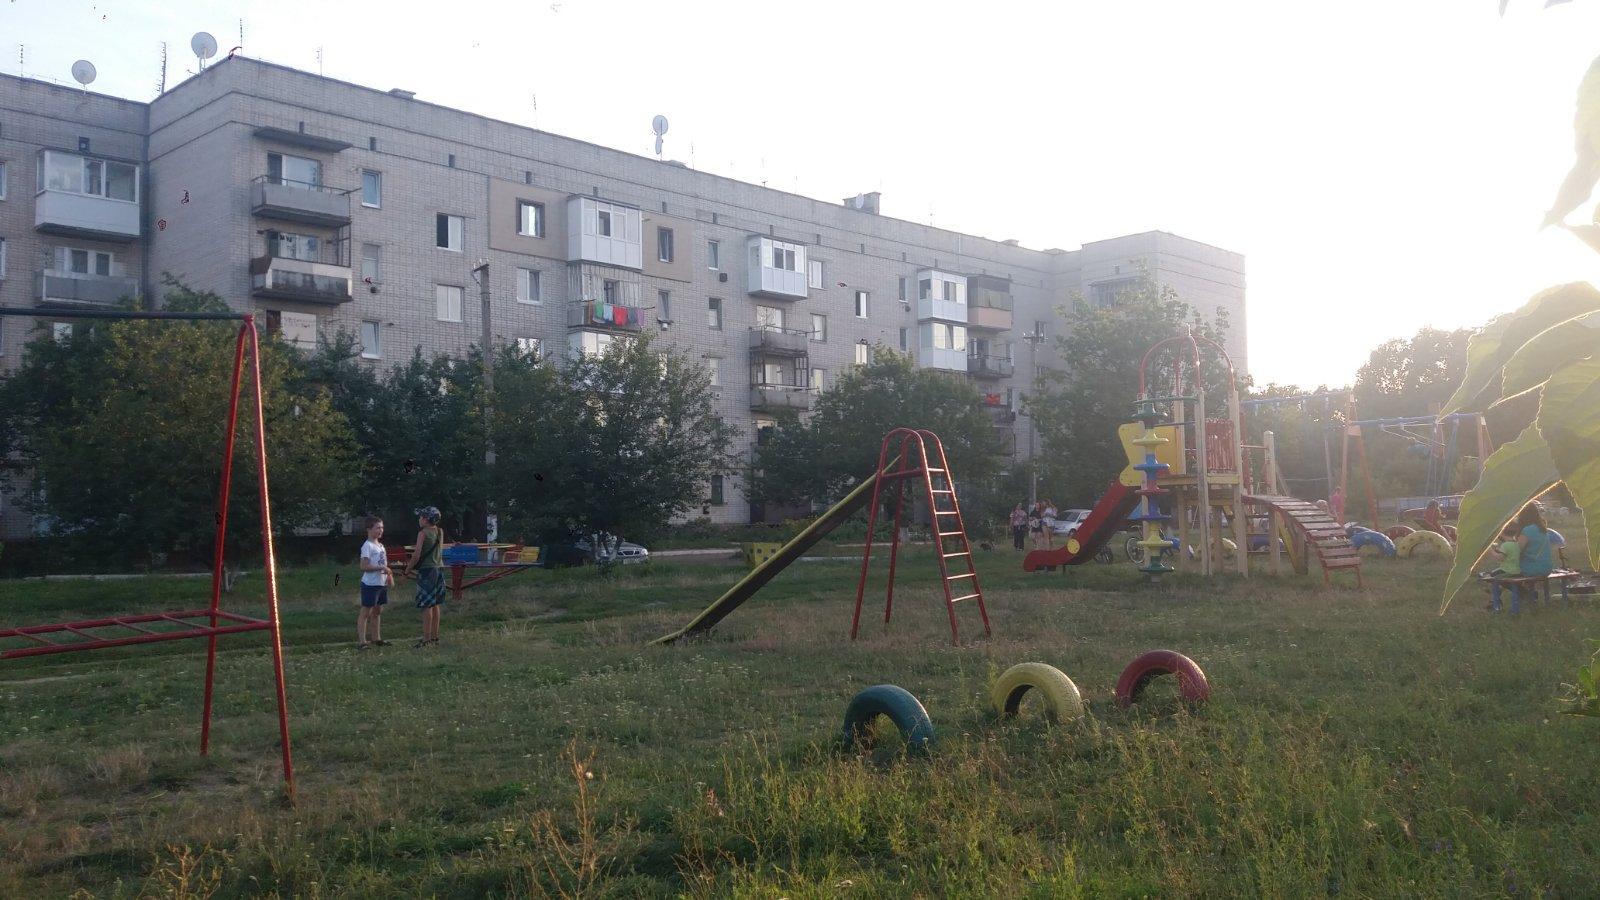 Монополизация рынка или буква закона: в Валках 110 квартир остались без газа